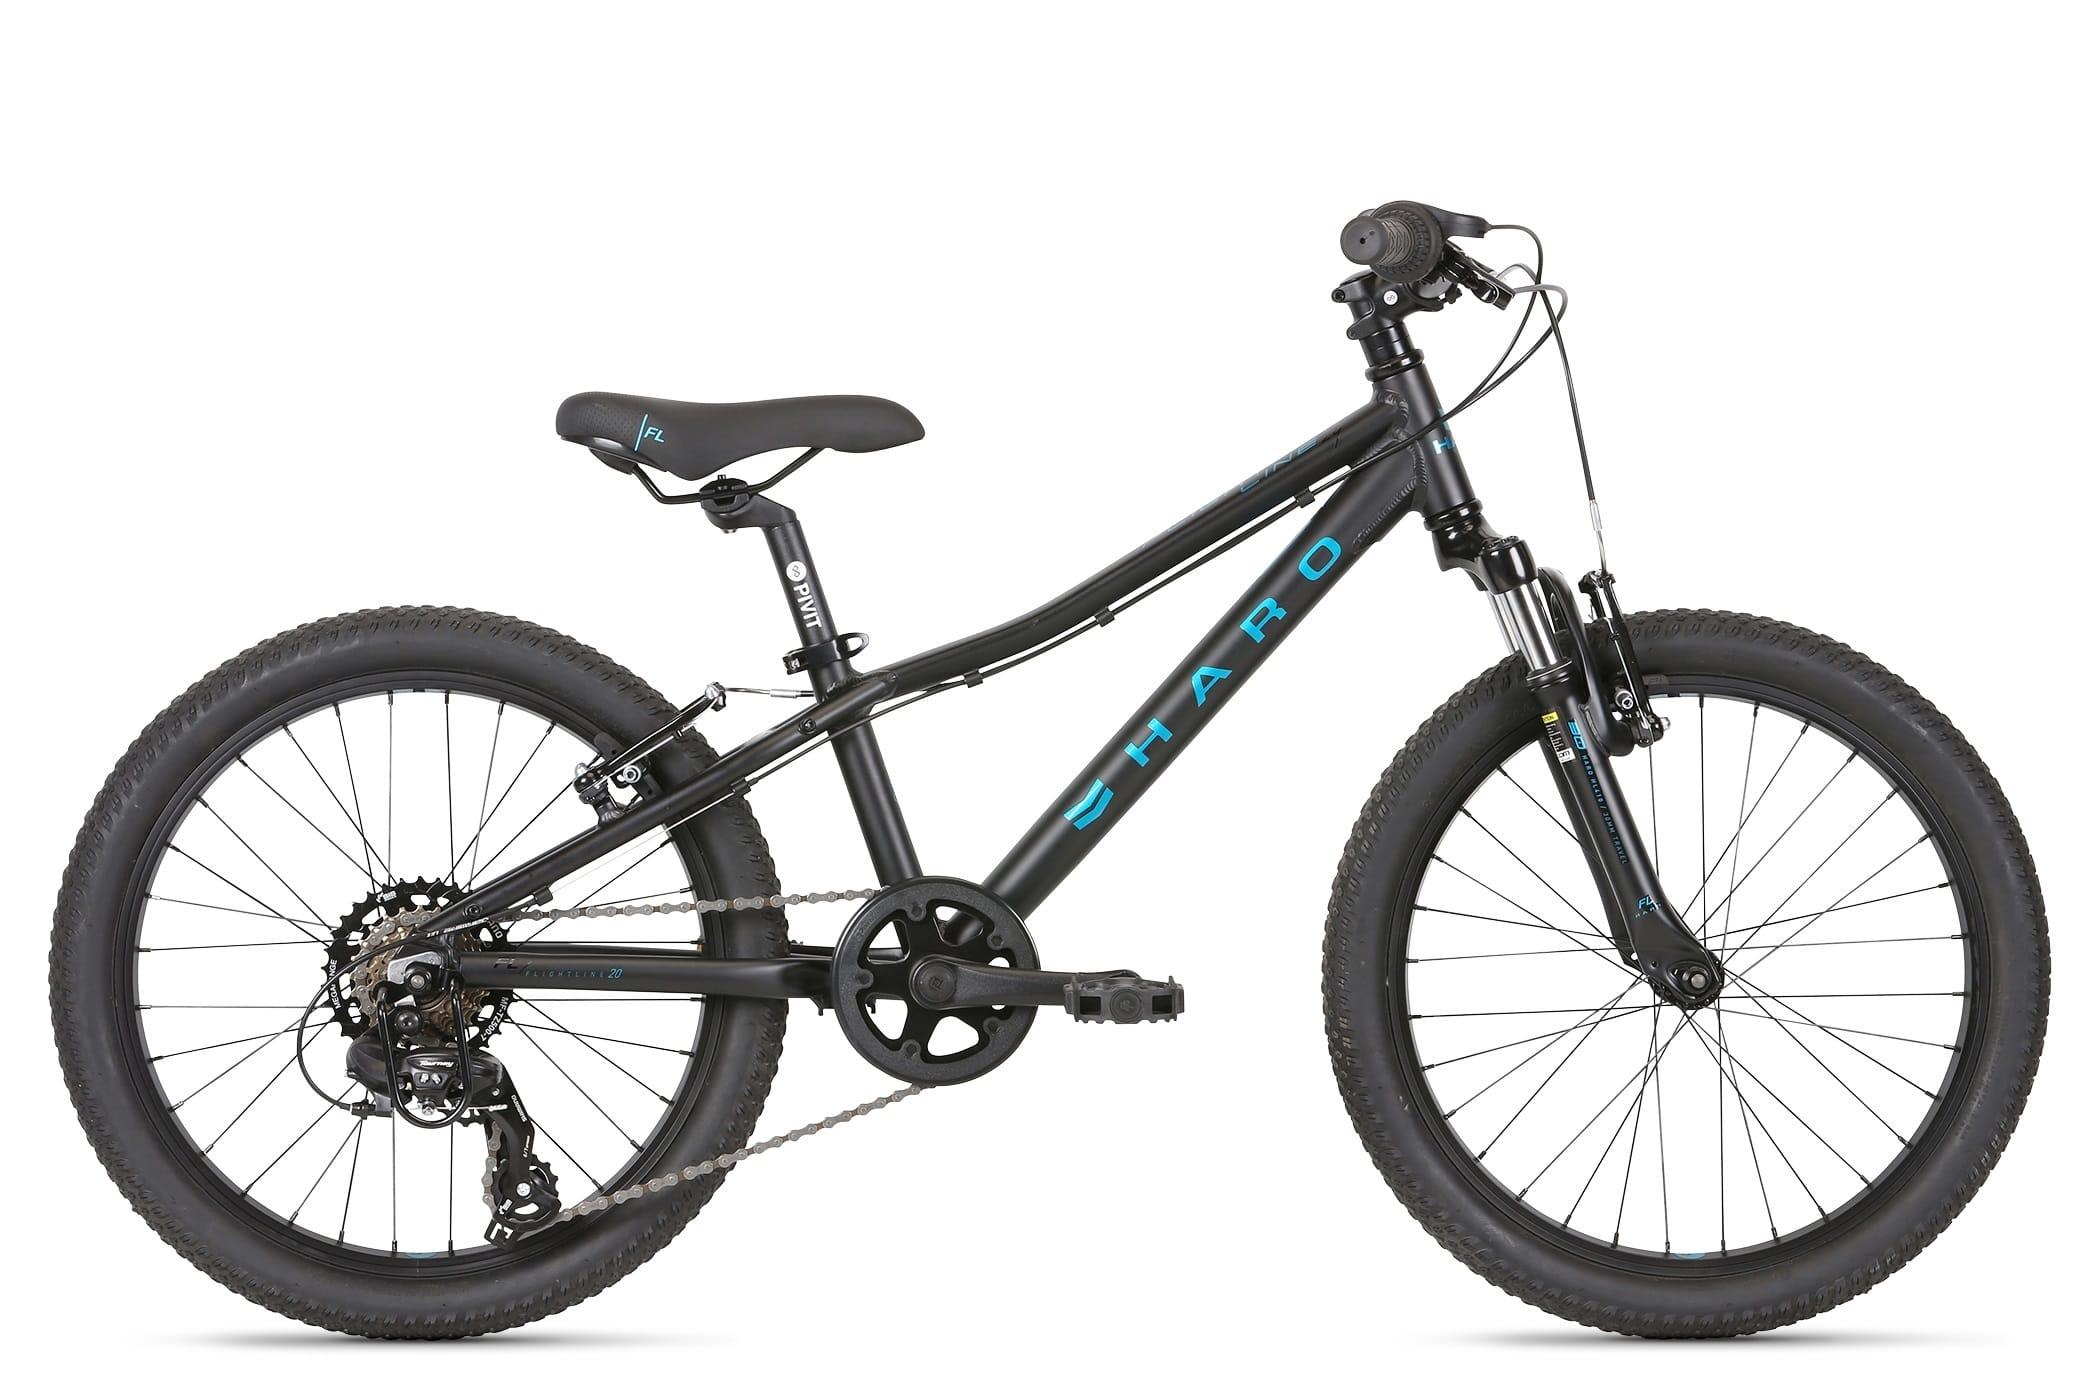 Haro Flightline 20 Bike - Black